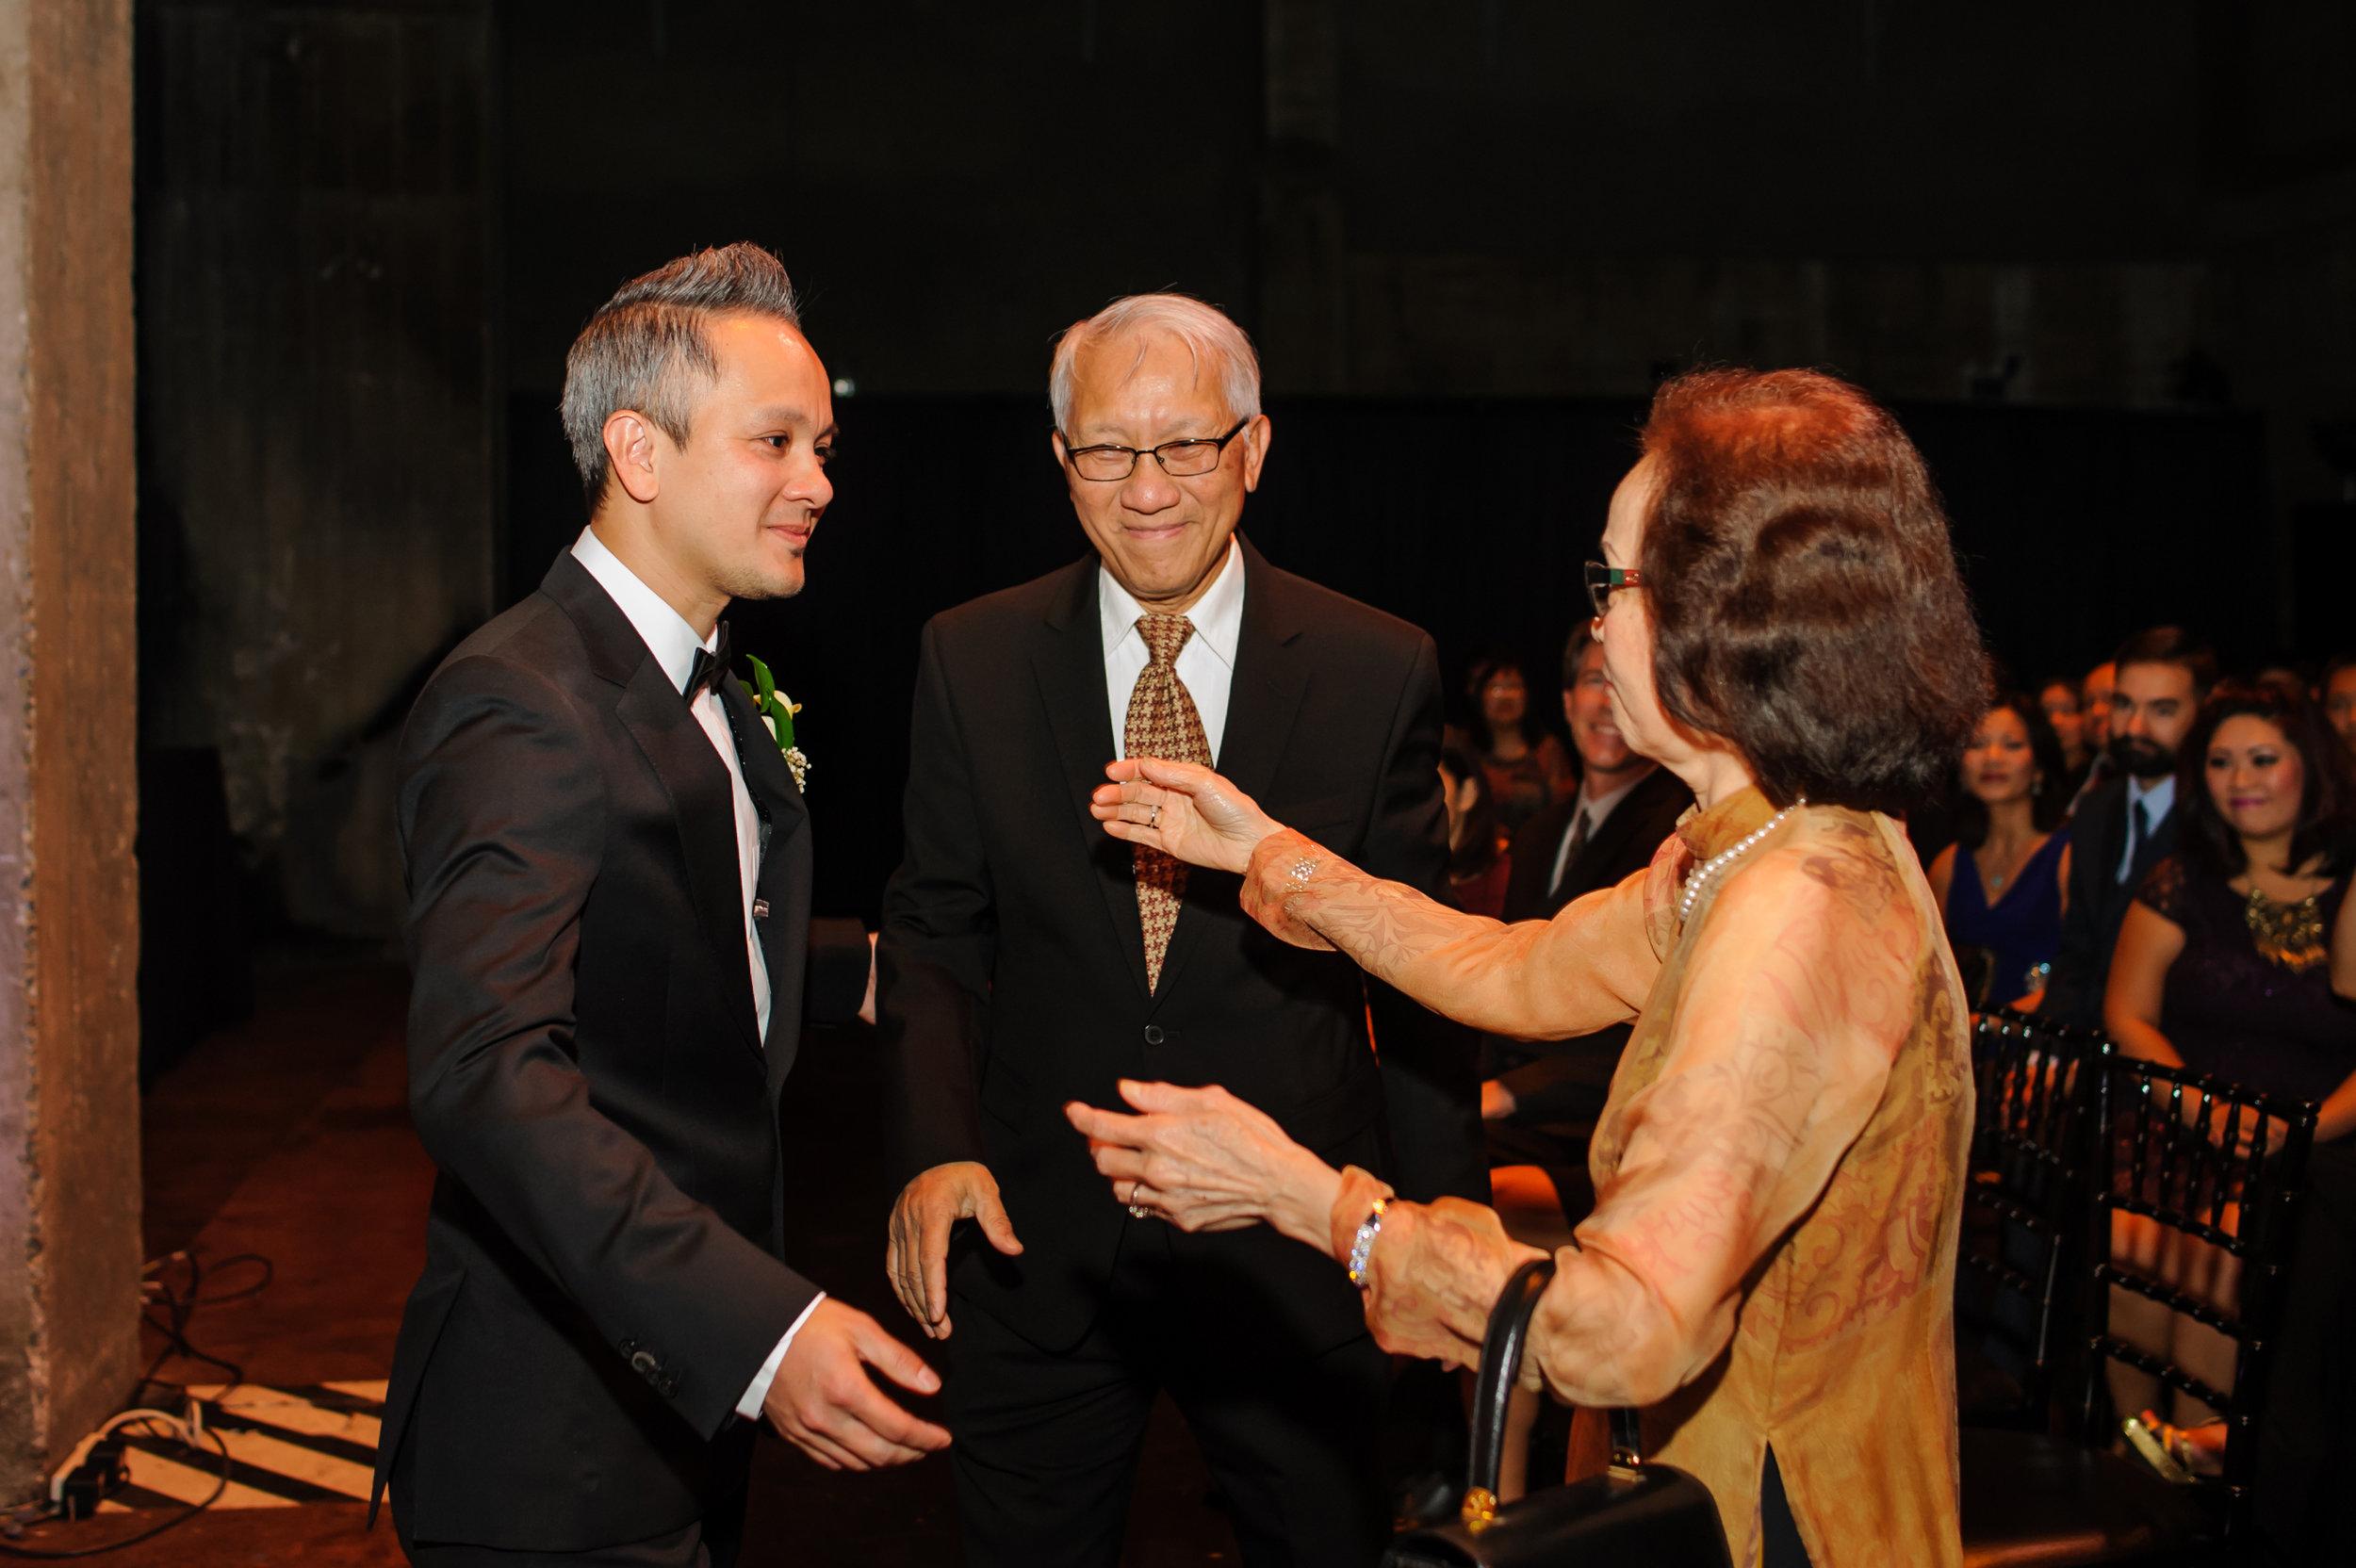 camilla-thuy-081-memorial-auditorium-sacramento-wedding-photographer-katherine-nicole-photography.JPG